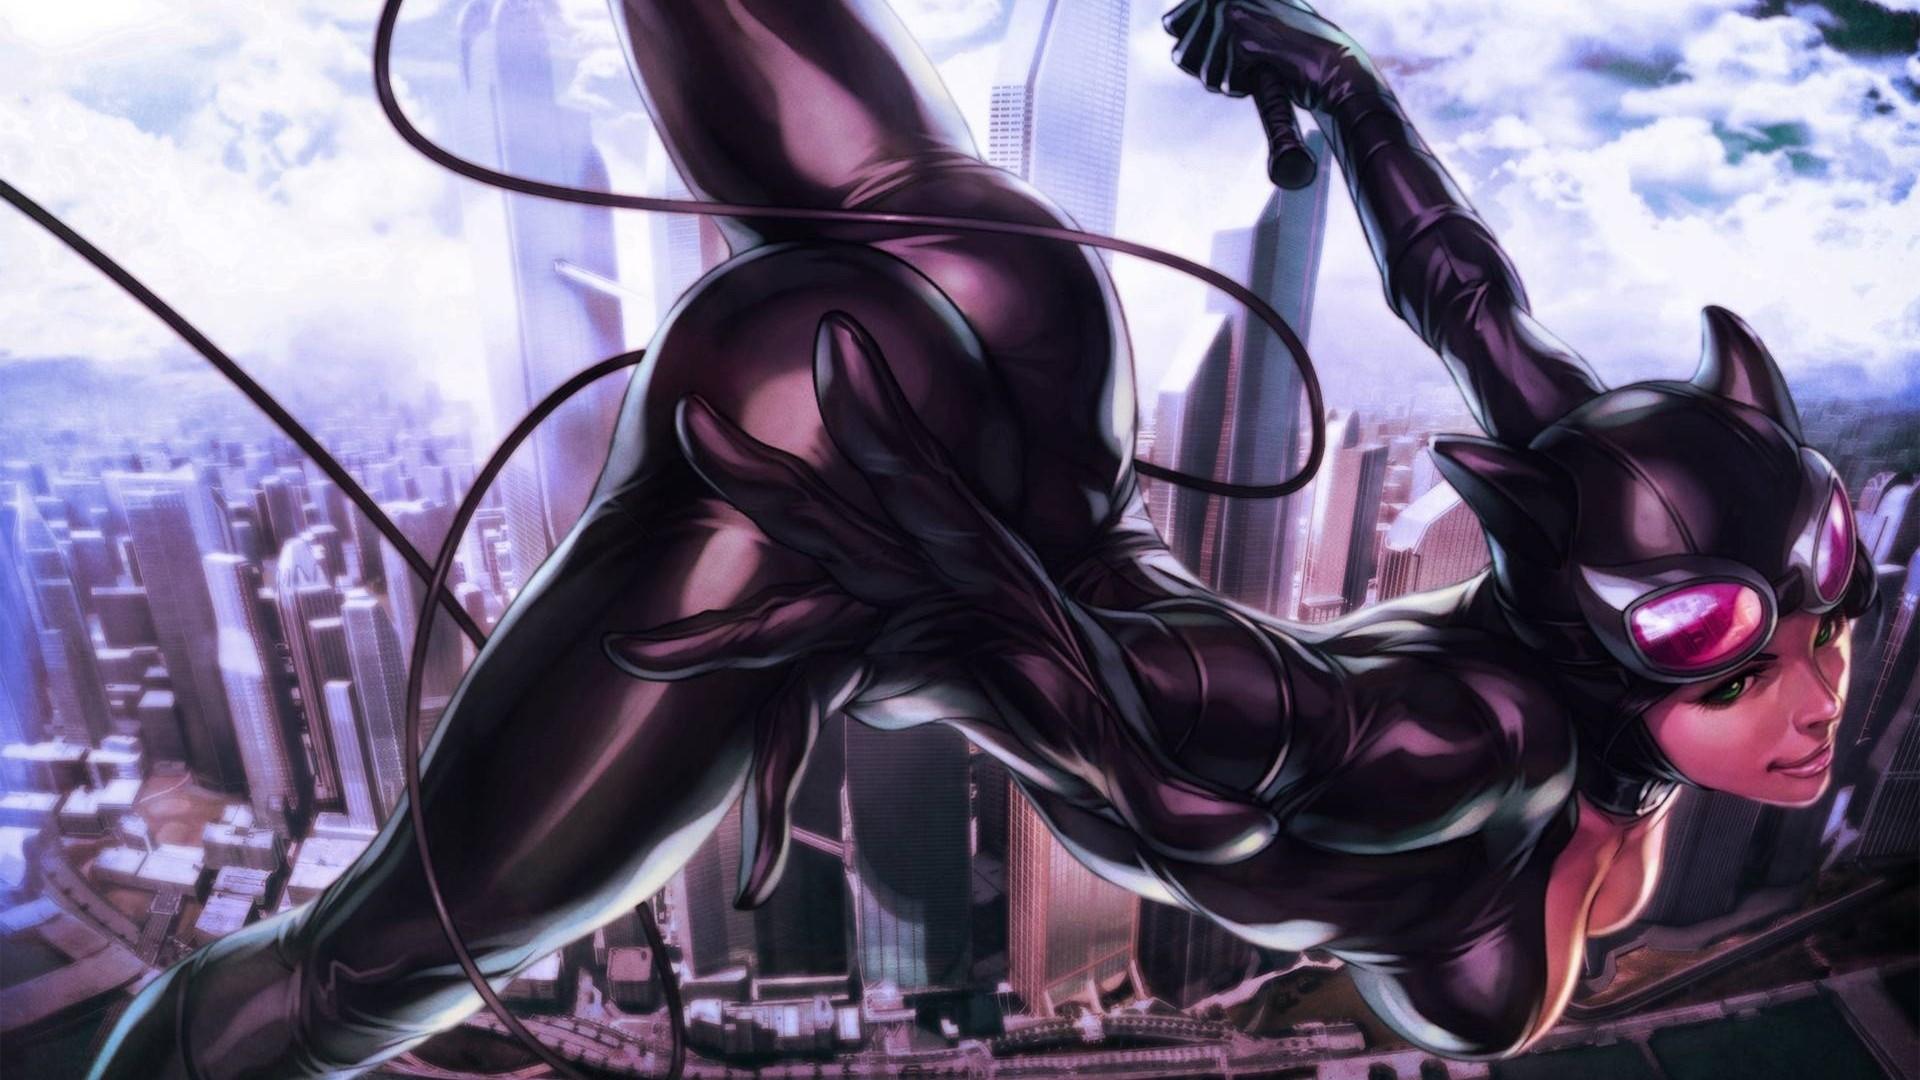 Catwoman Wallpaper HD